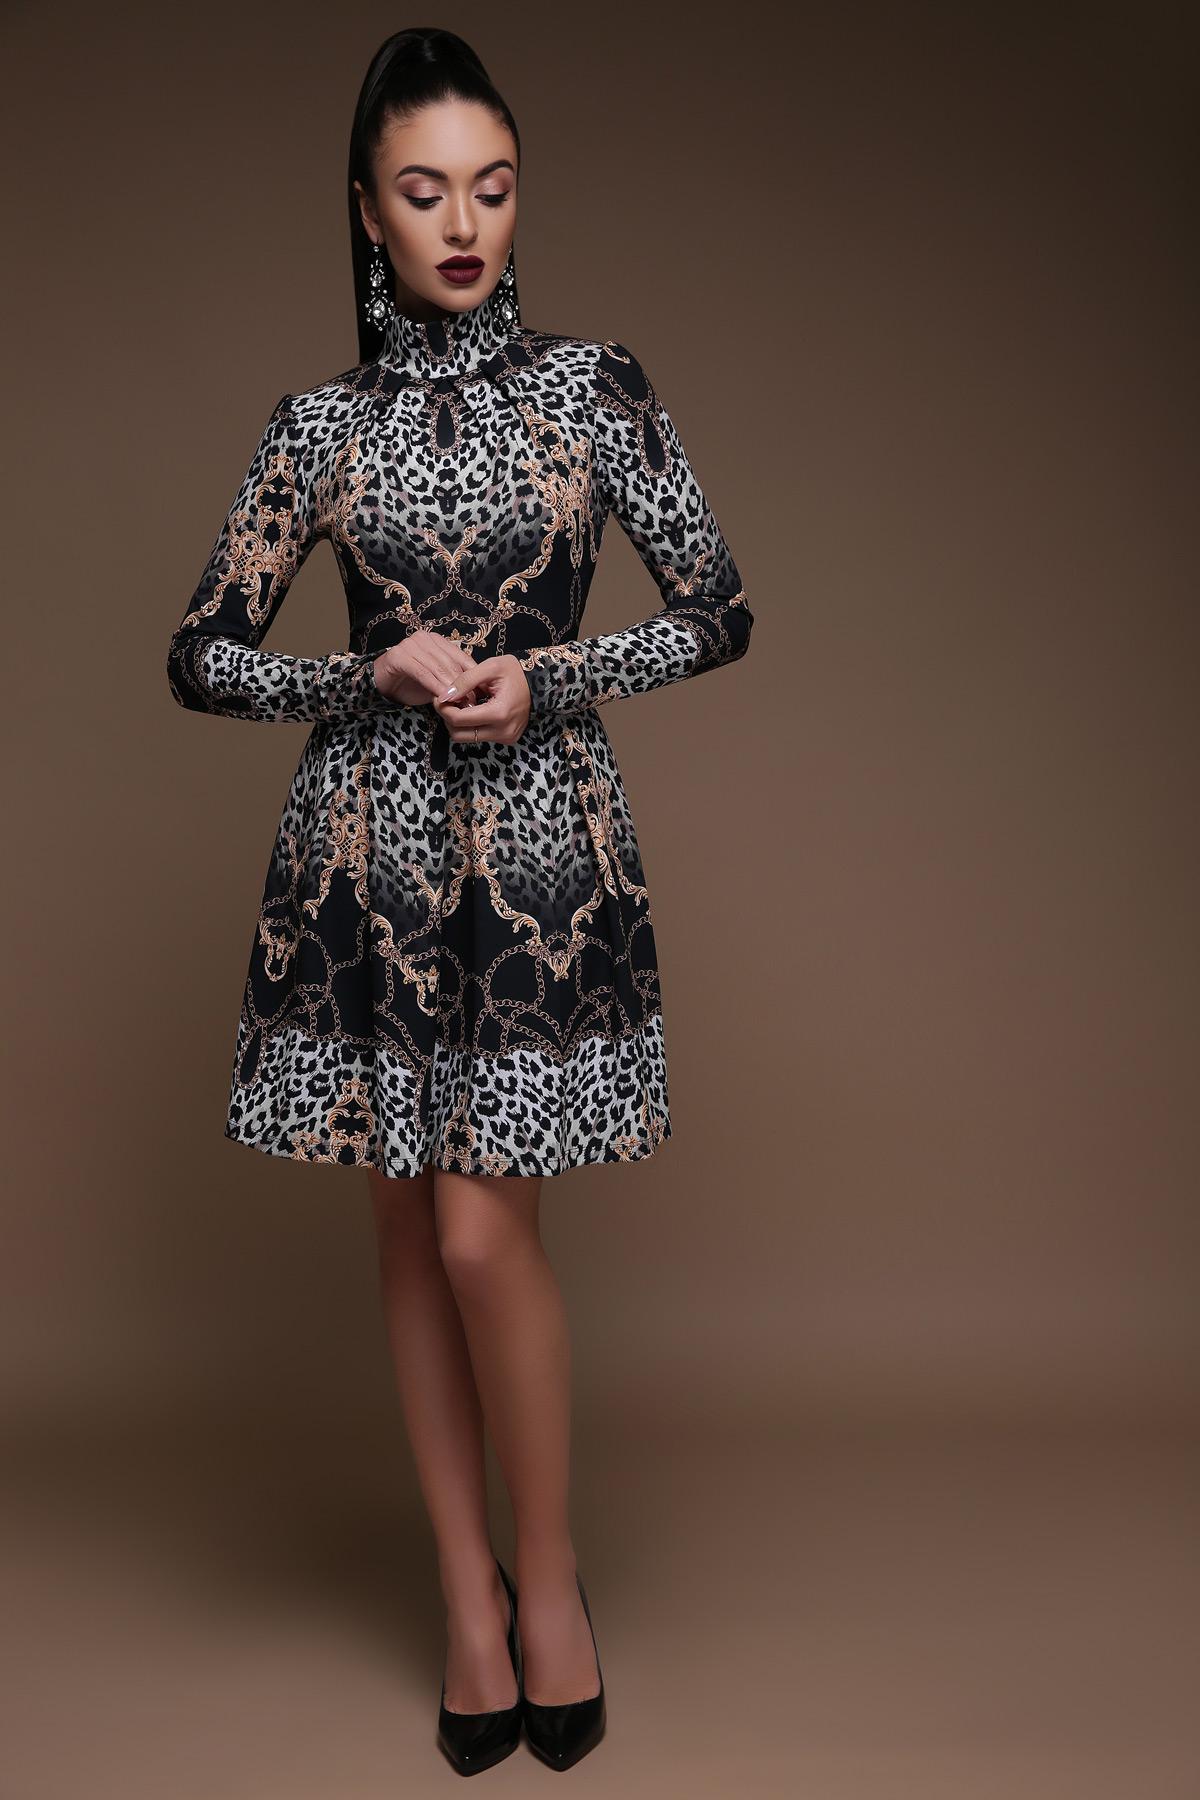 9bc4f41d5a3 Цвет  леопардовое платье со складками. Леопард-цепи платье Эльнара д р.